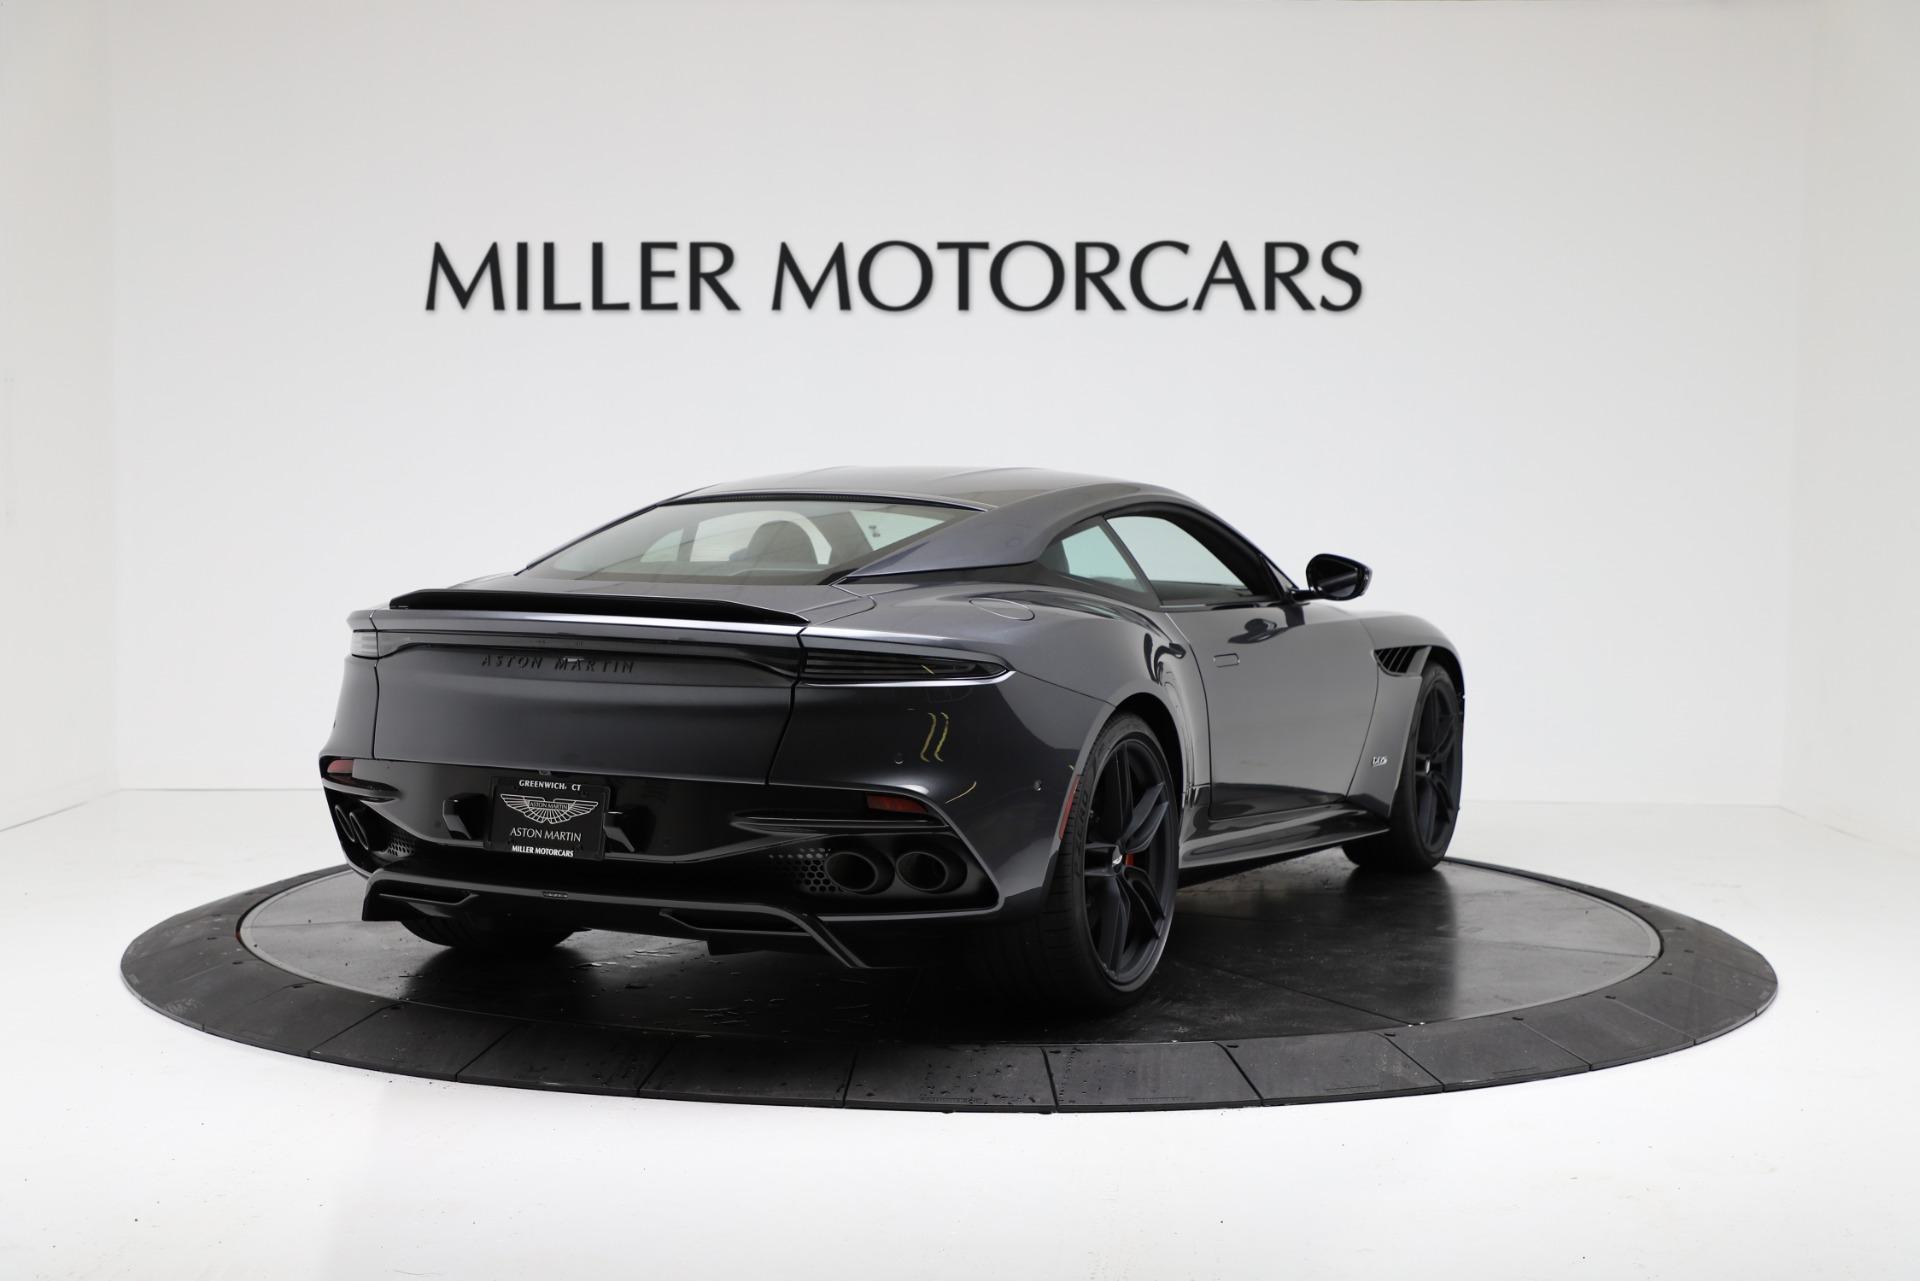 New 2019 Aston Martin DBS Superleggera Coupe For Sale In Greenwich, CT 3318_p6